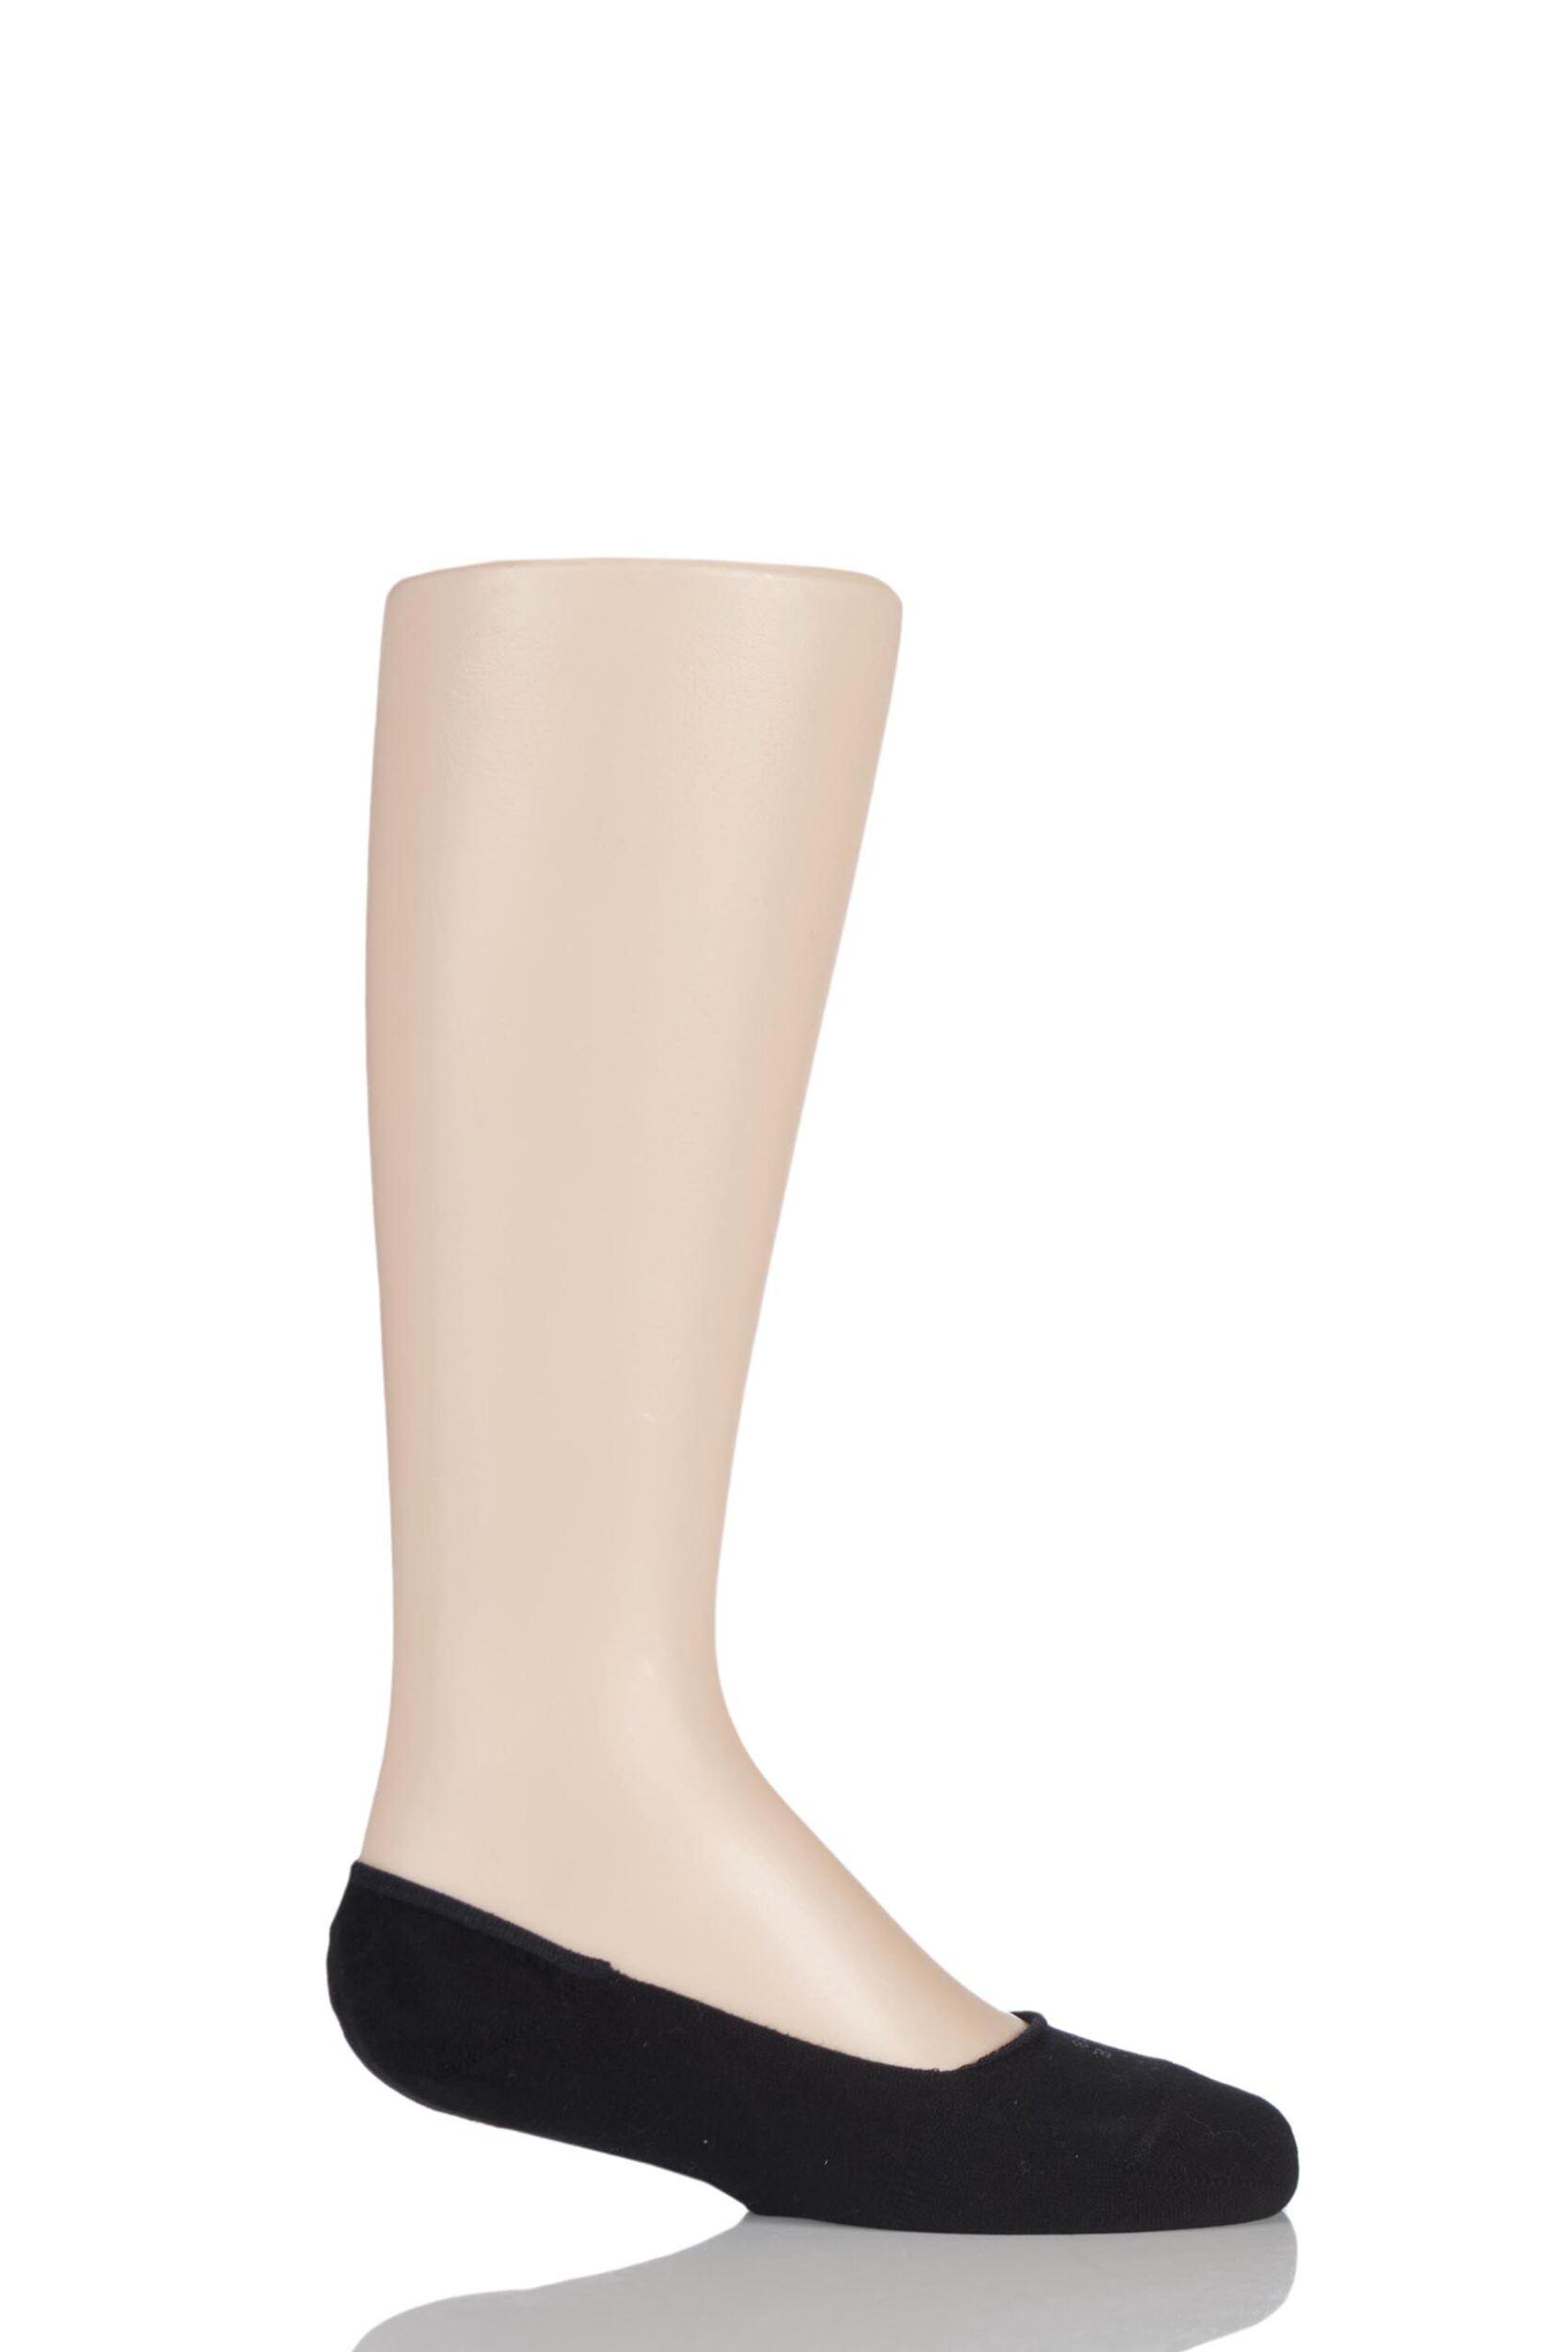 1 Pair Black Invisible Step Shoe Liners Kids Unisex 3-5 Teens (12-13 Years) - Falke